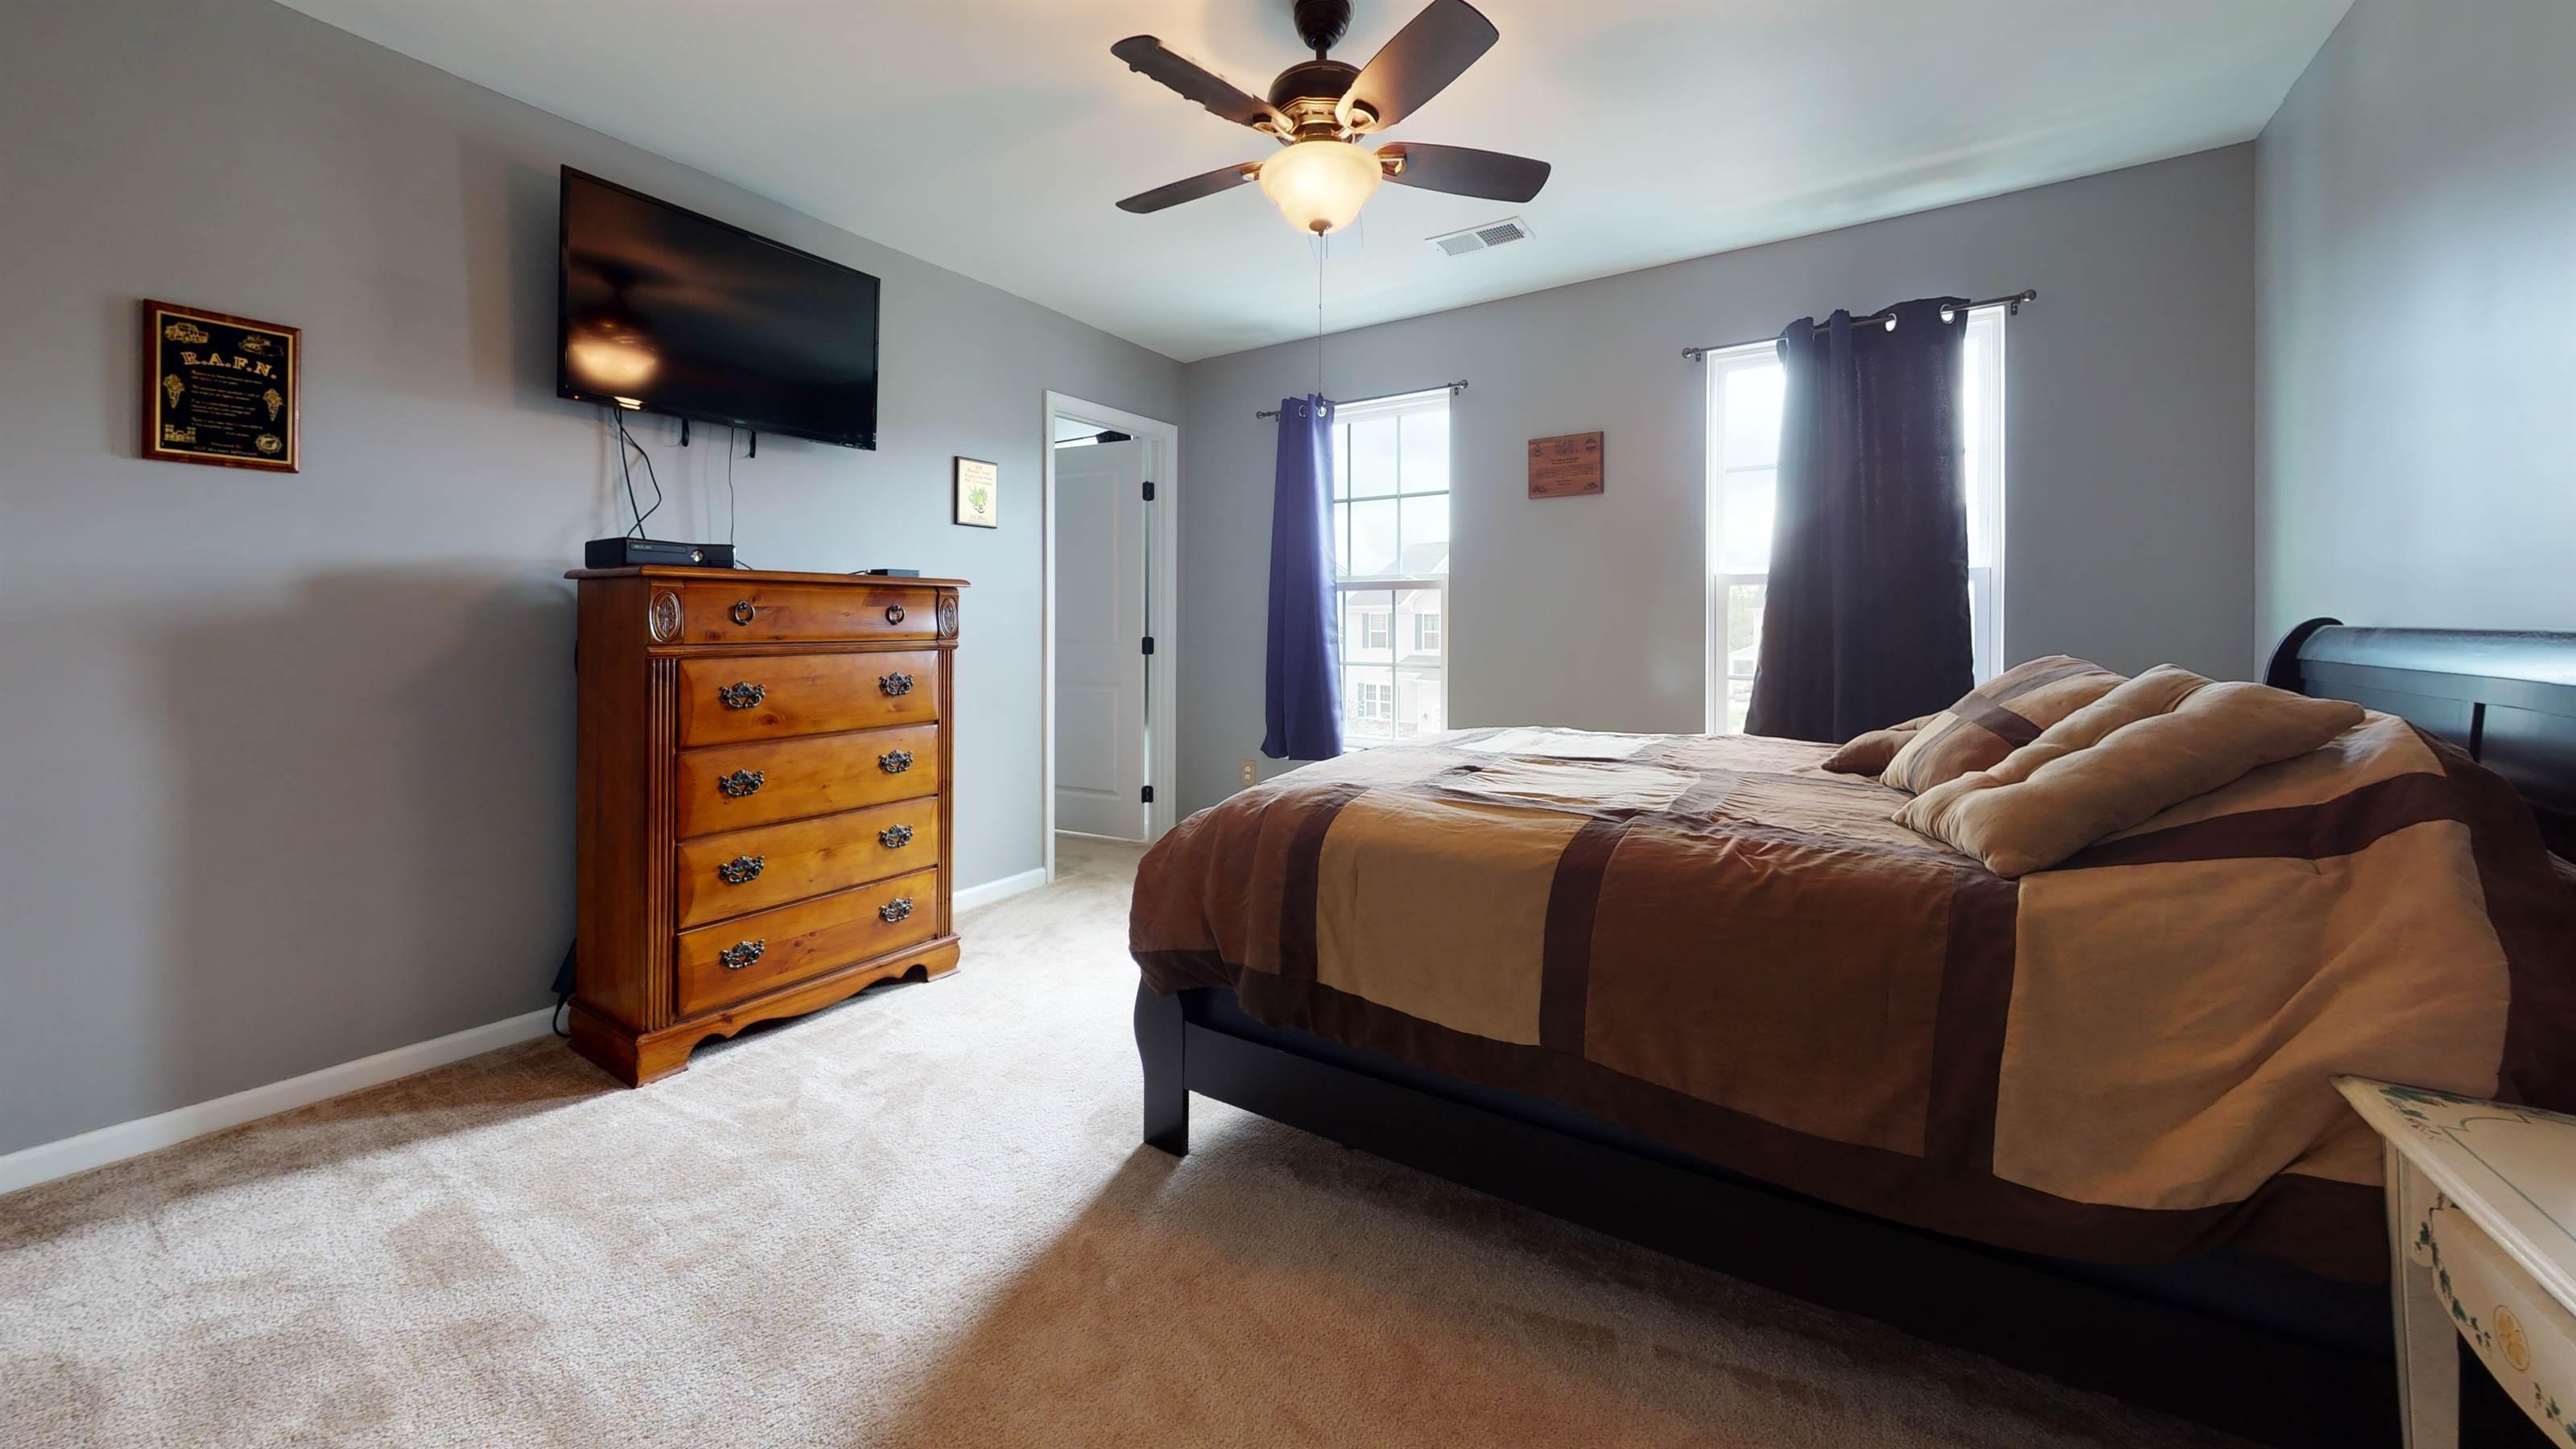 106 Rooftop Court, Stephenson, VA 22656